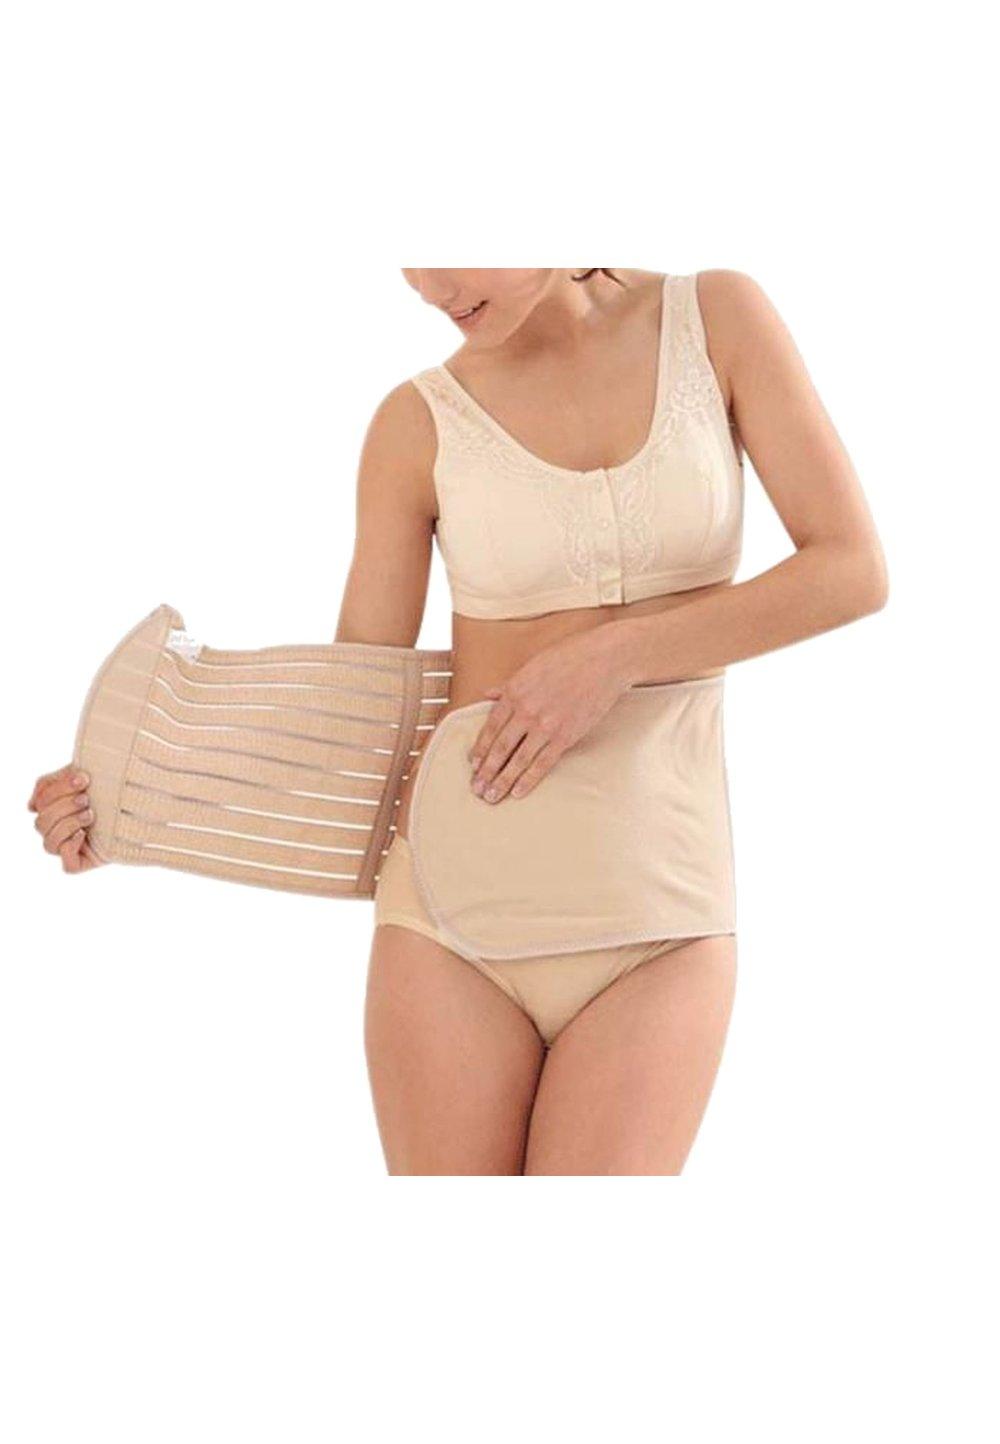 Centura postnatala, pentru recuperare, crem imagine